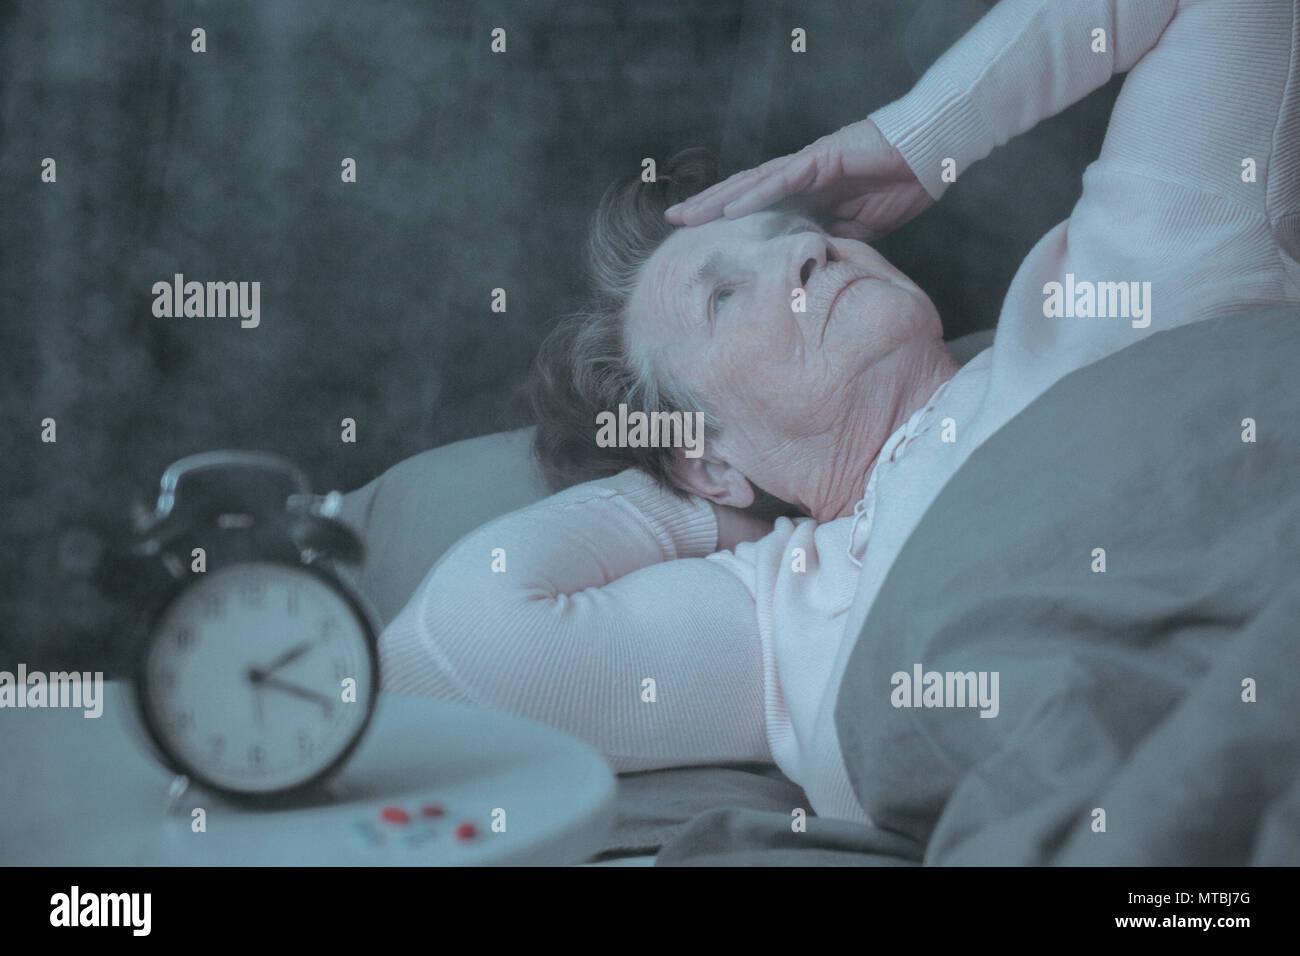 Senior woman having sleep disorder, lying in bed - Stock Image